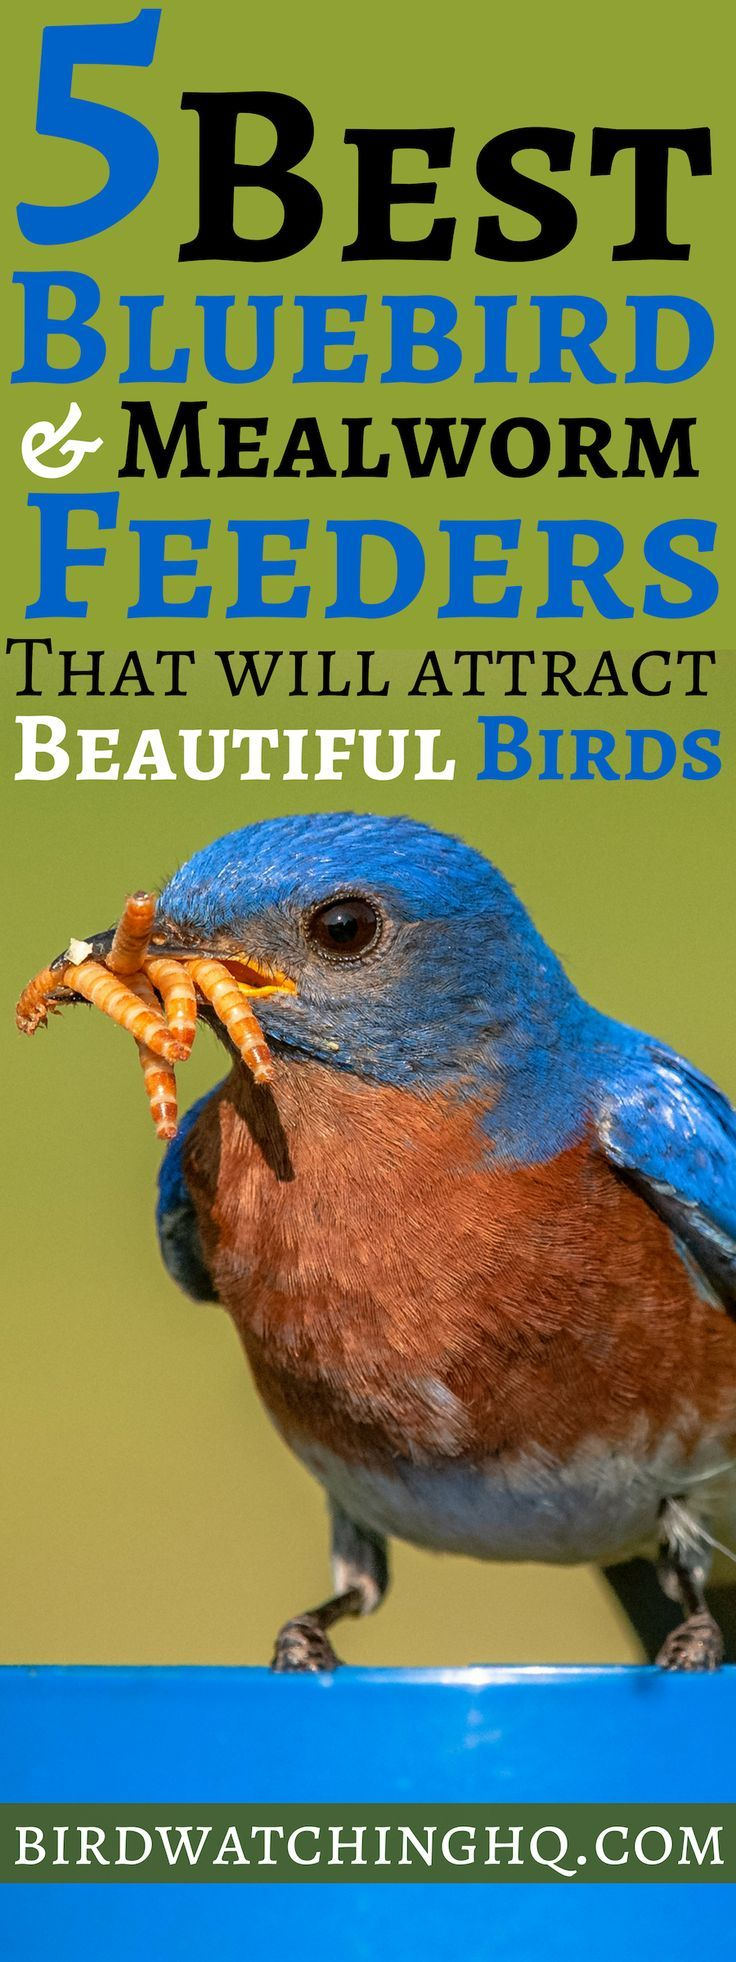 The 5 BEST Bluebird & Mealworm Feeders To Try (2020 Best